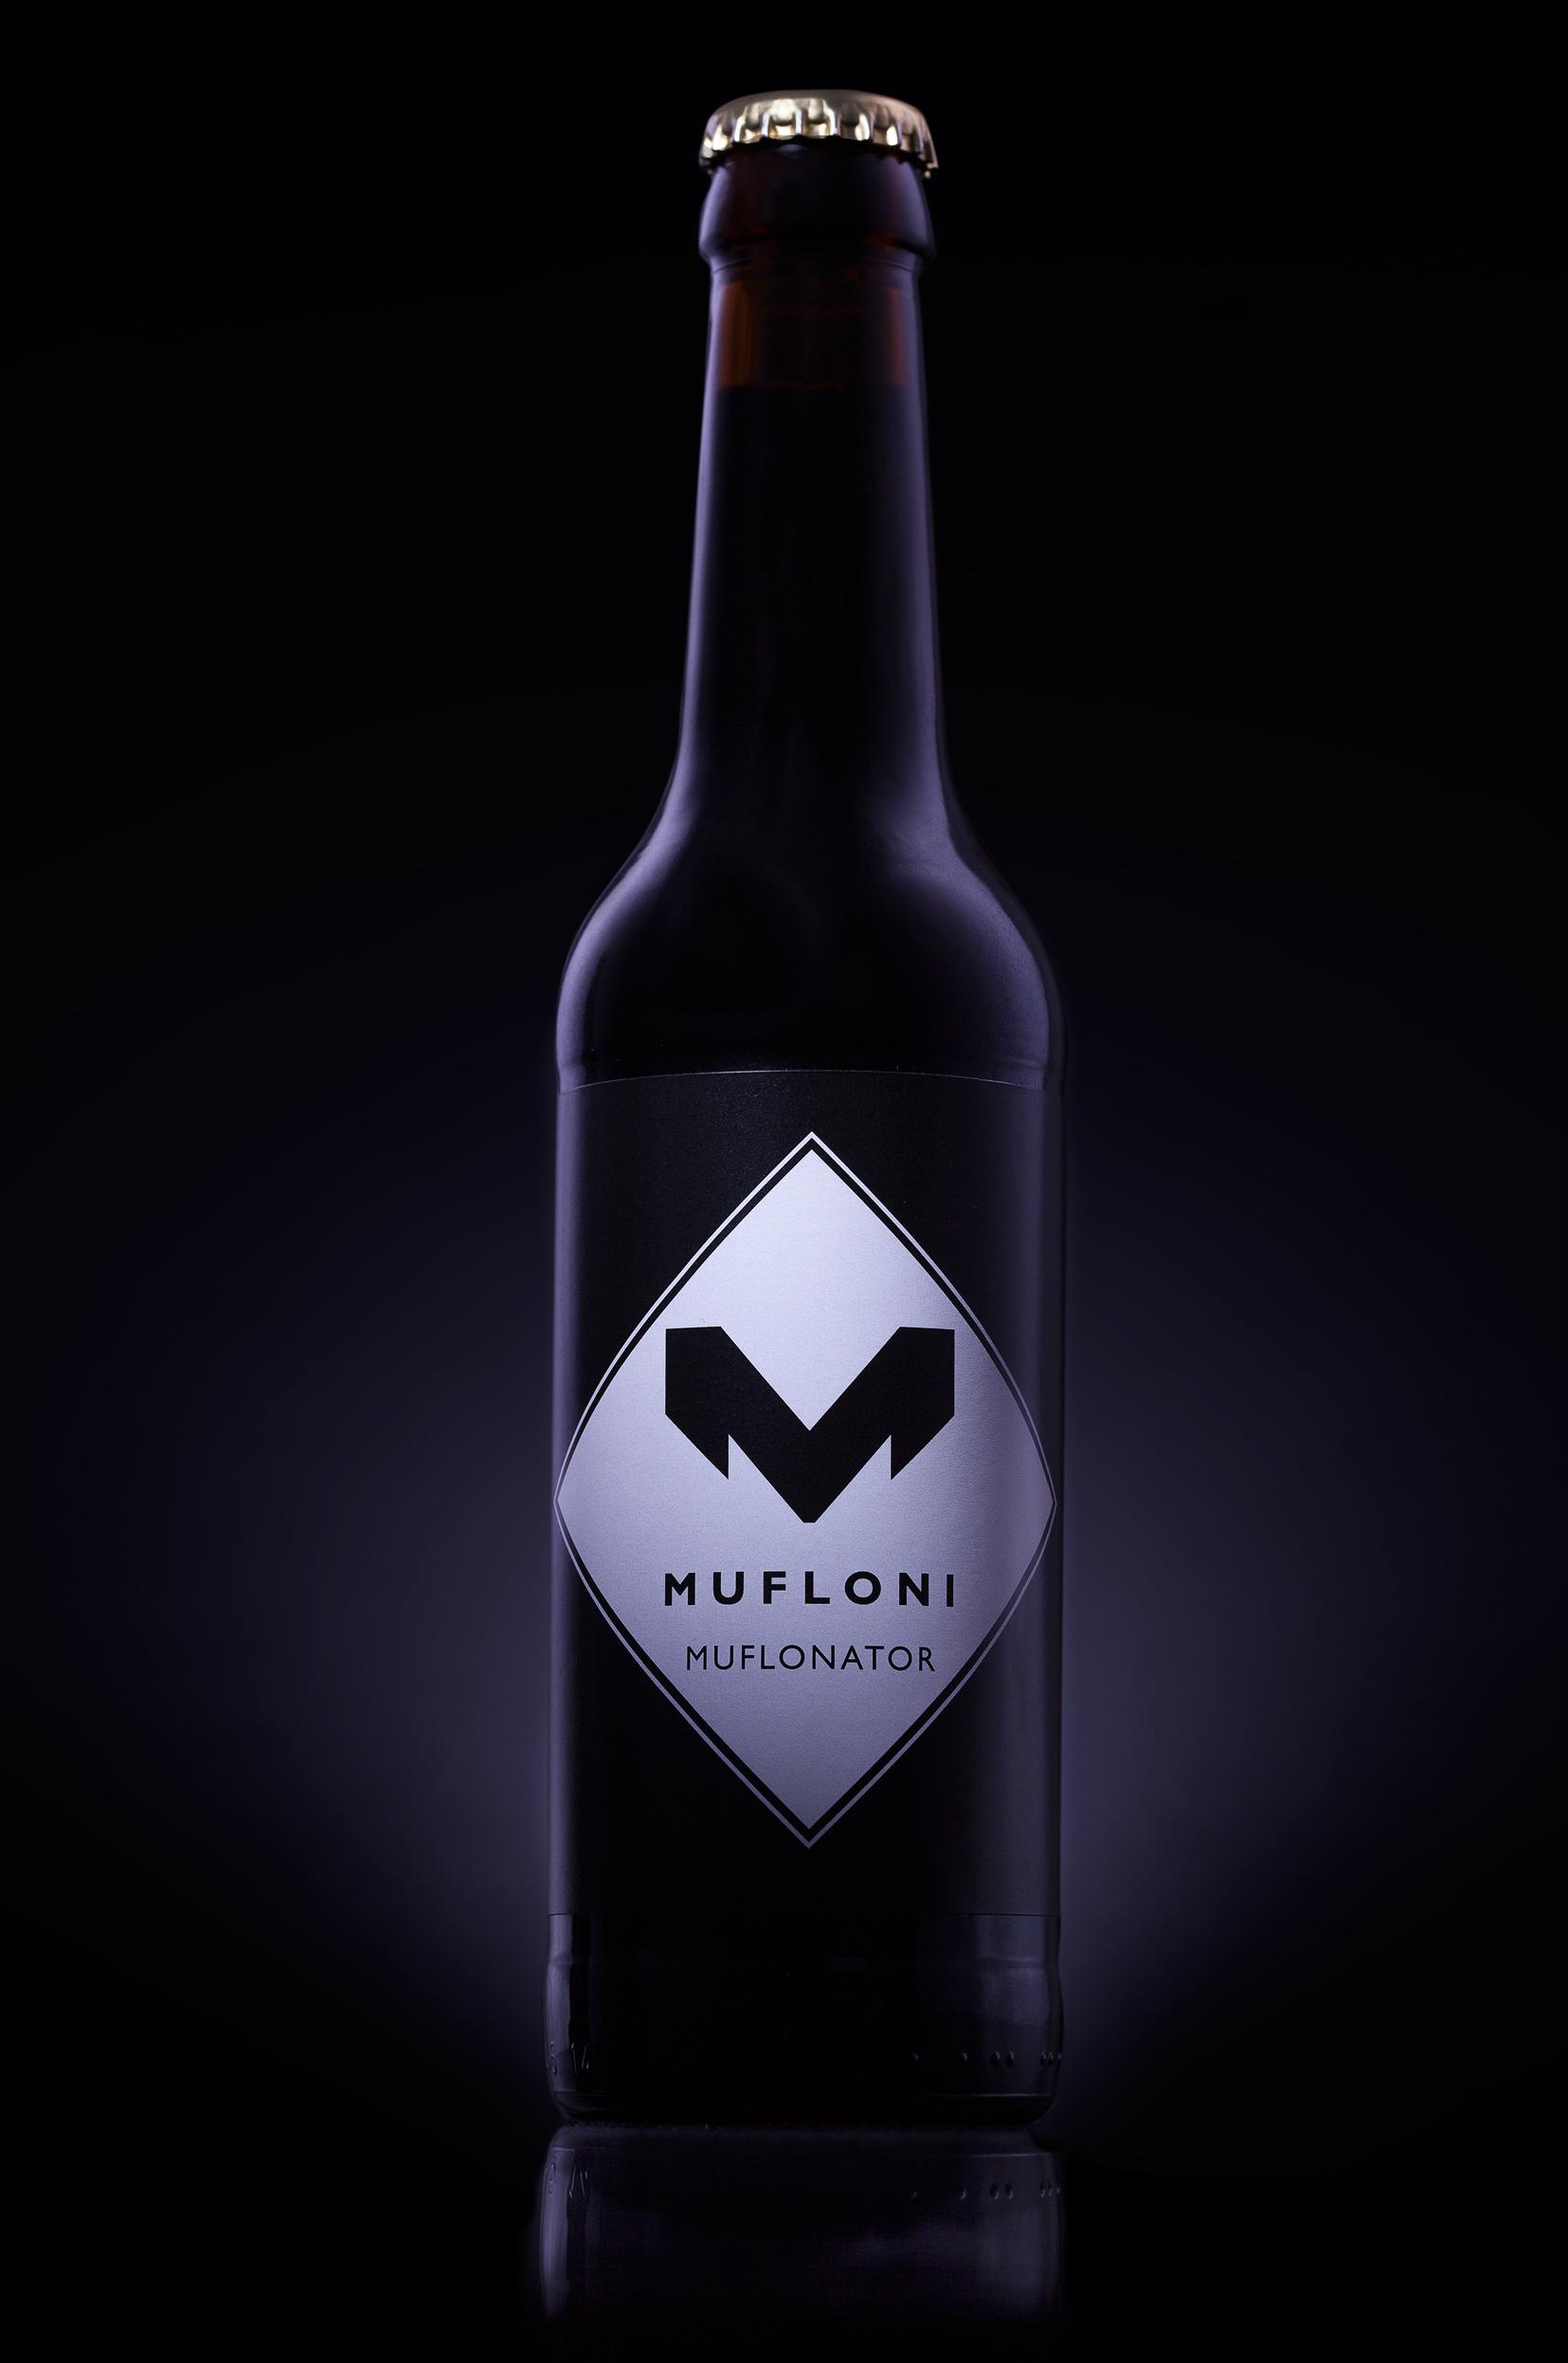 muffloni_after.jpg